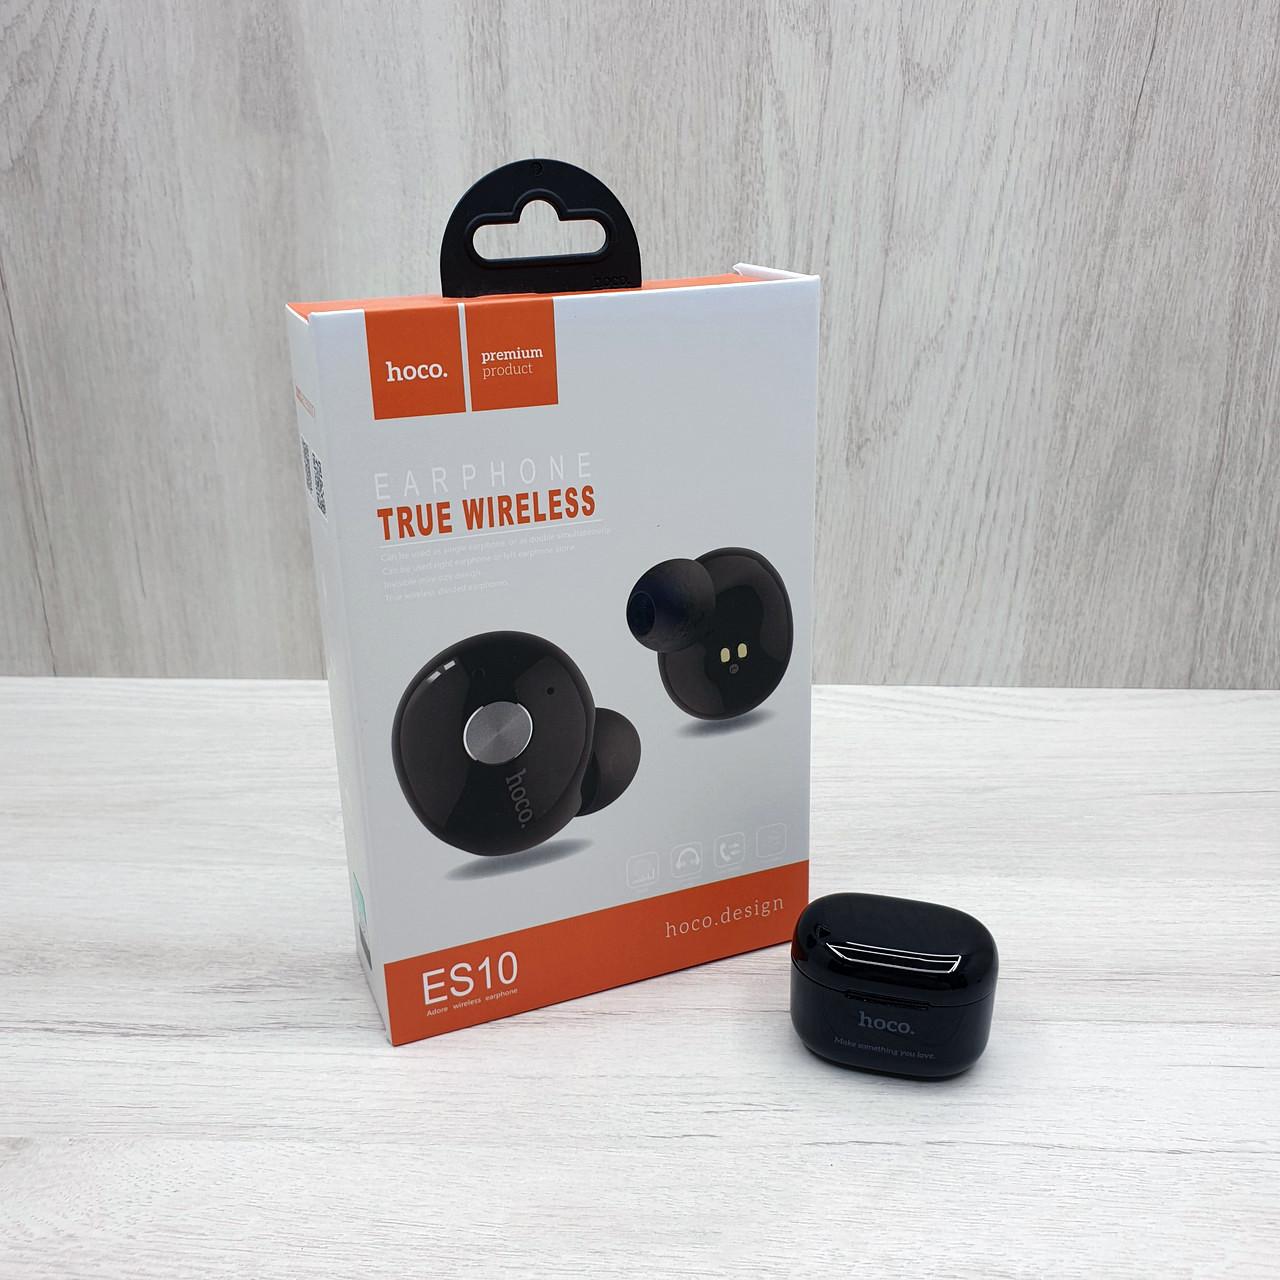 Бездротові Навушники HOCO ES10 Earphones (чорні)